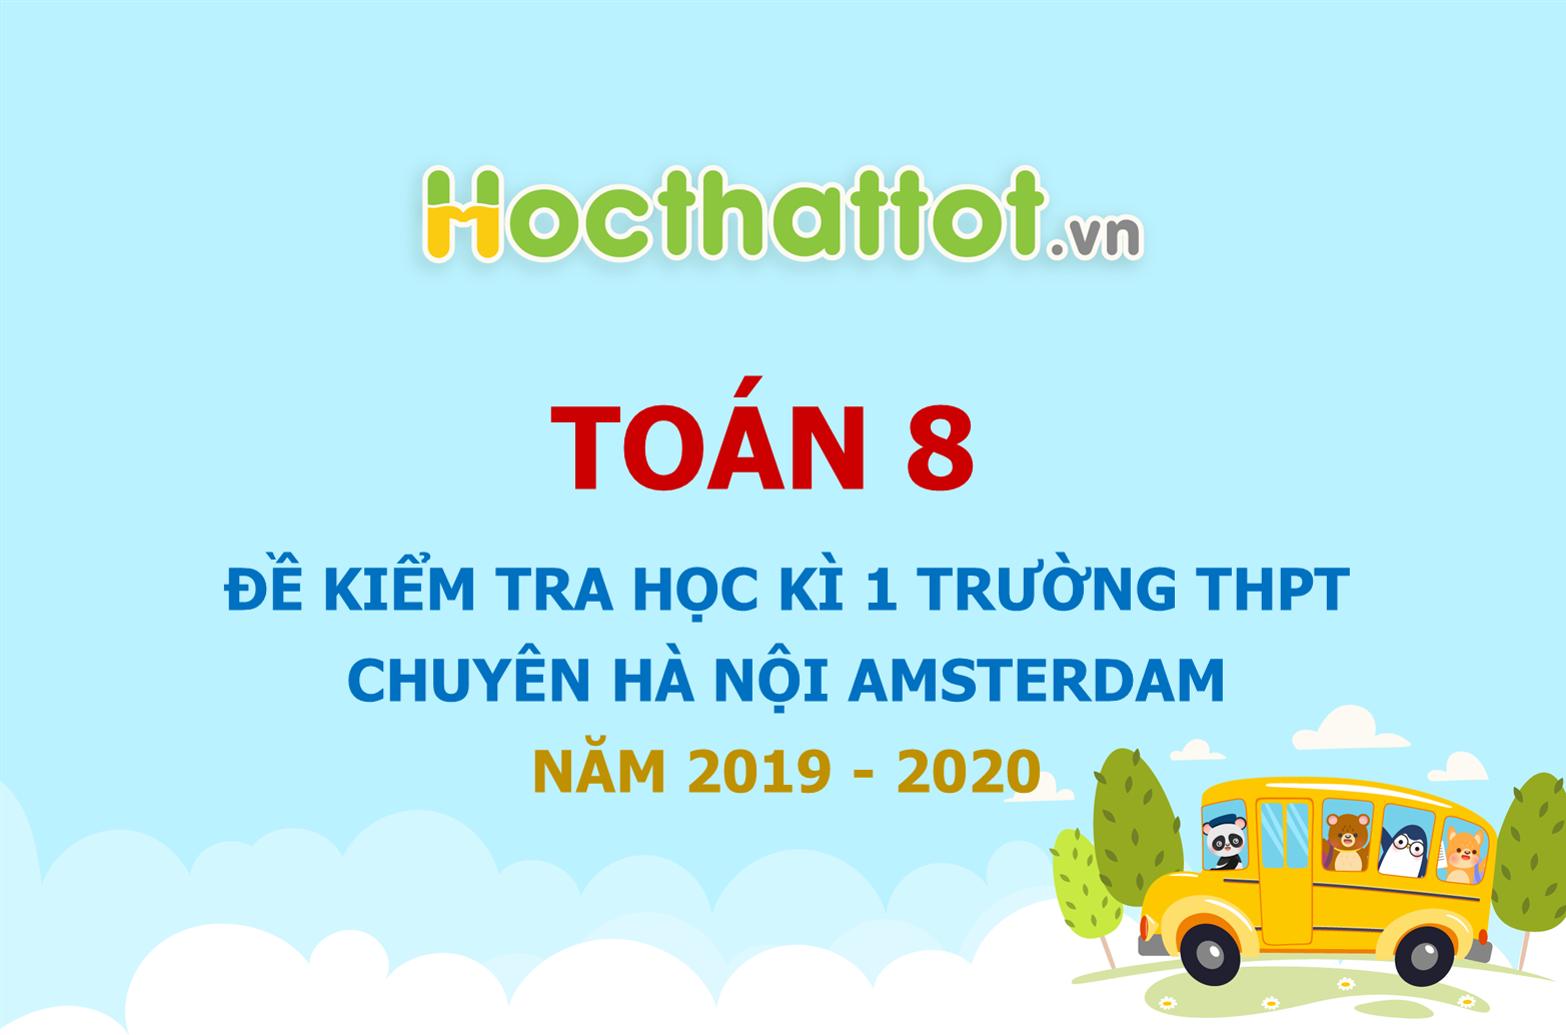 de-kiem-tra-hoc-ki-1-lop8-truong-thpt-chuyen-ha-noi-amsterdam-nam-2019-2020